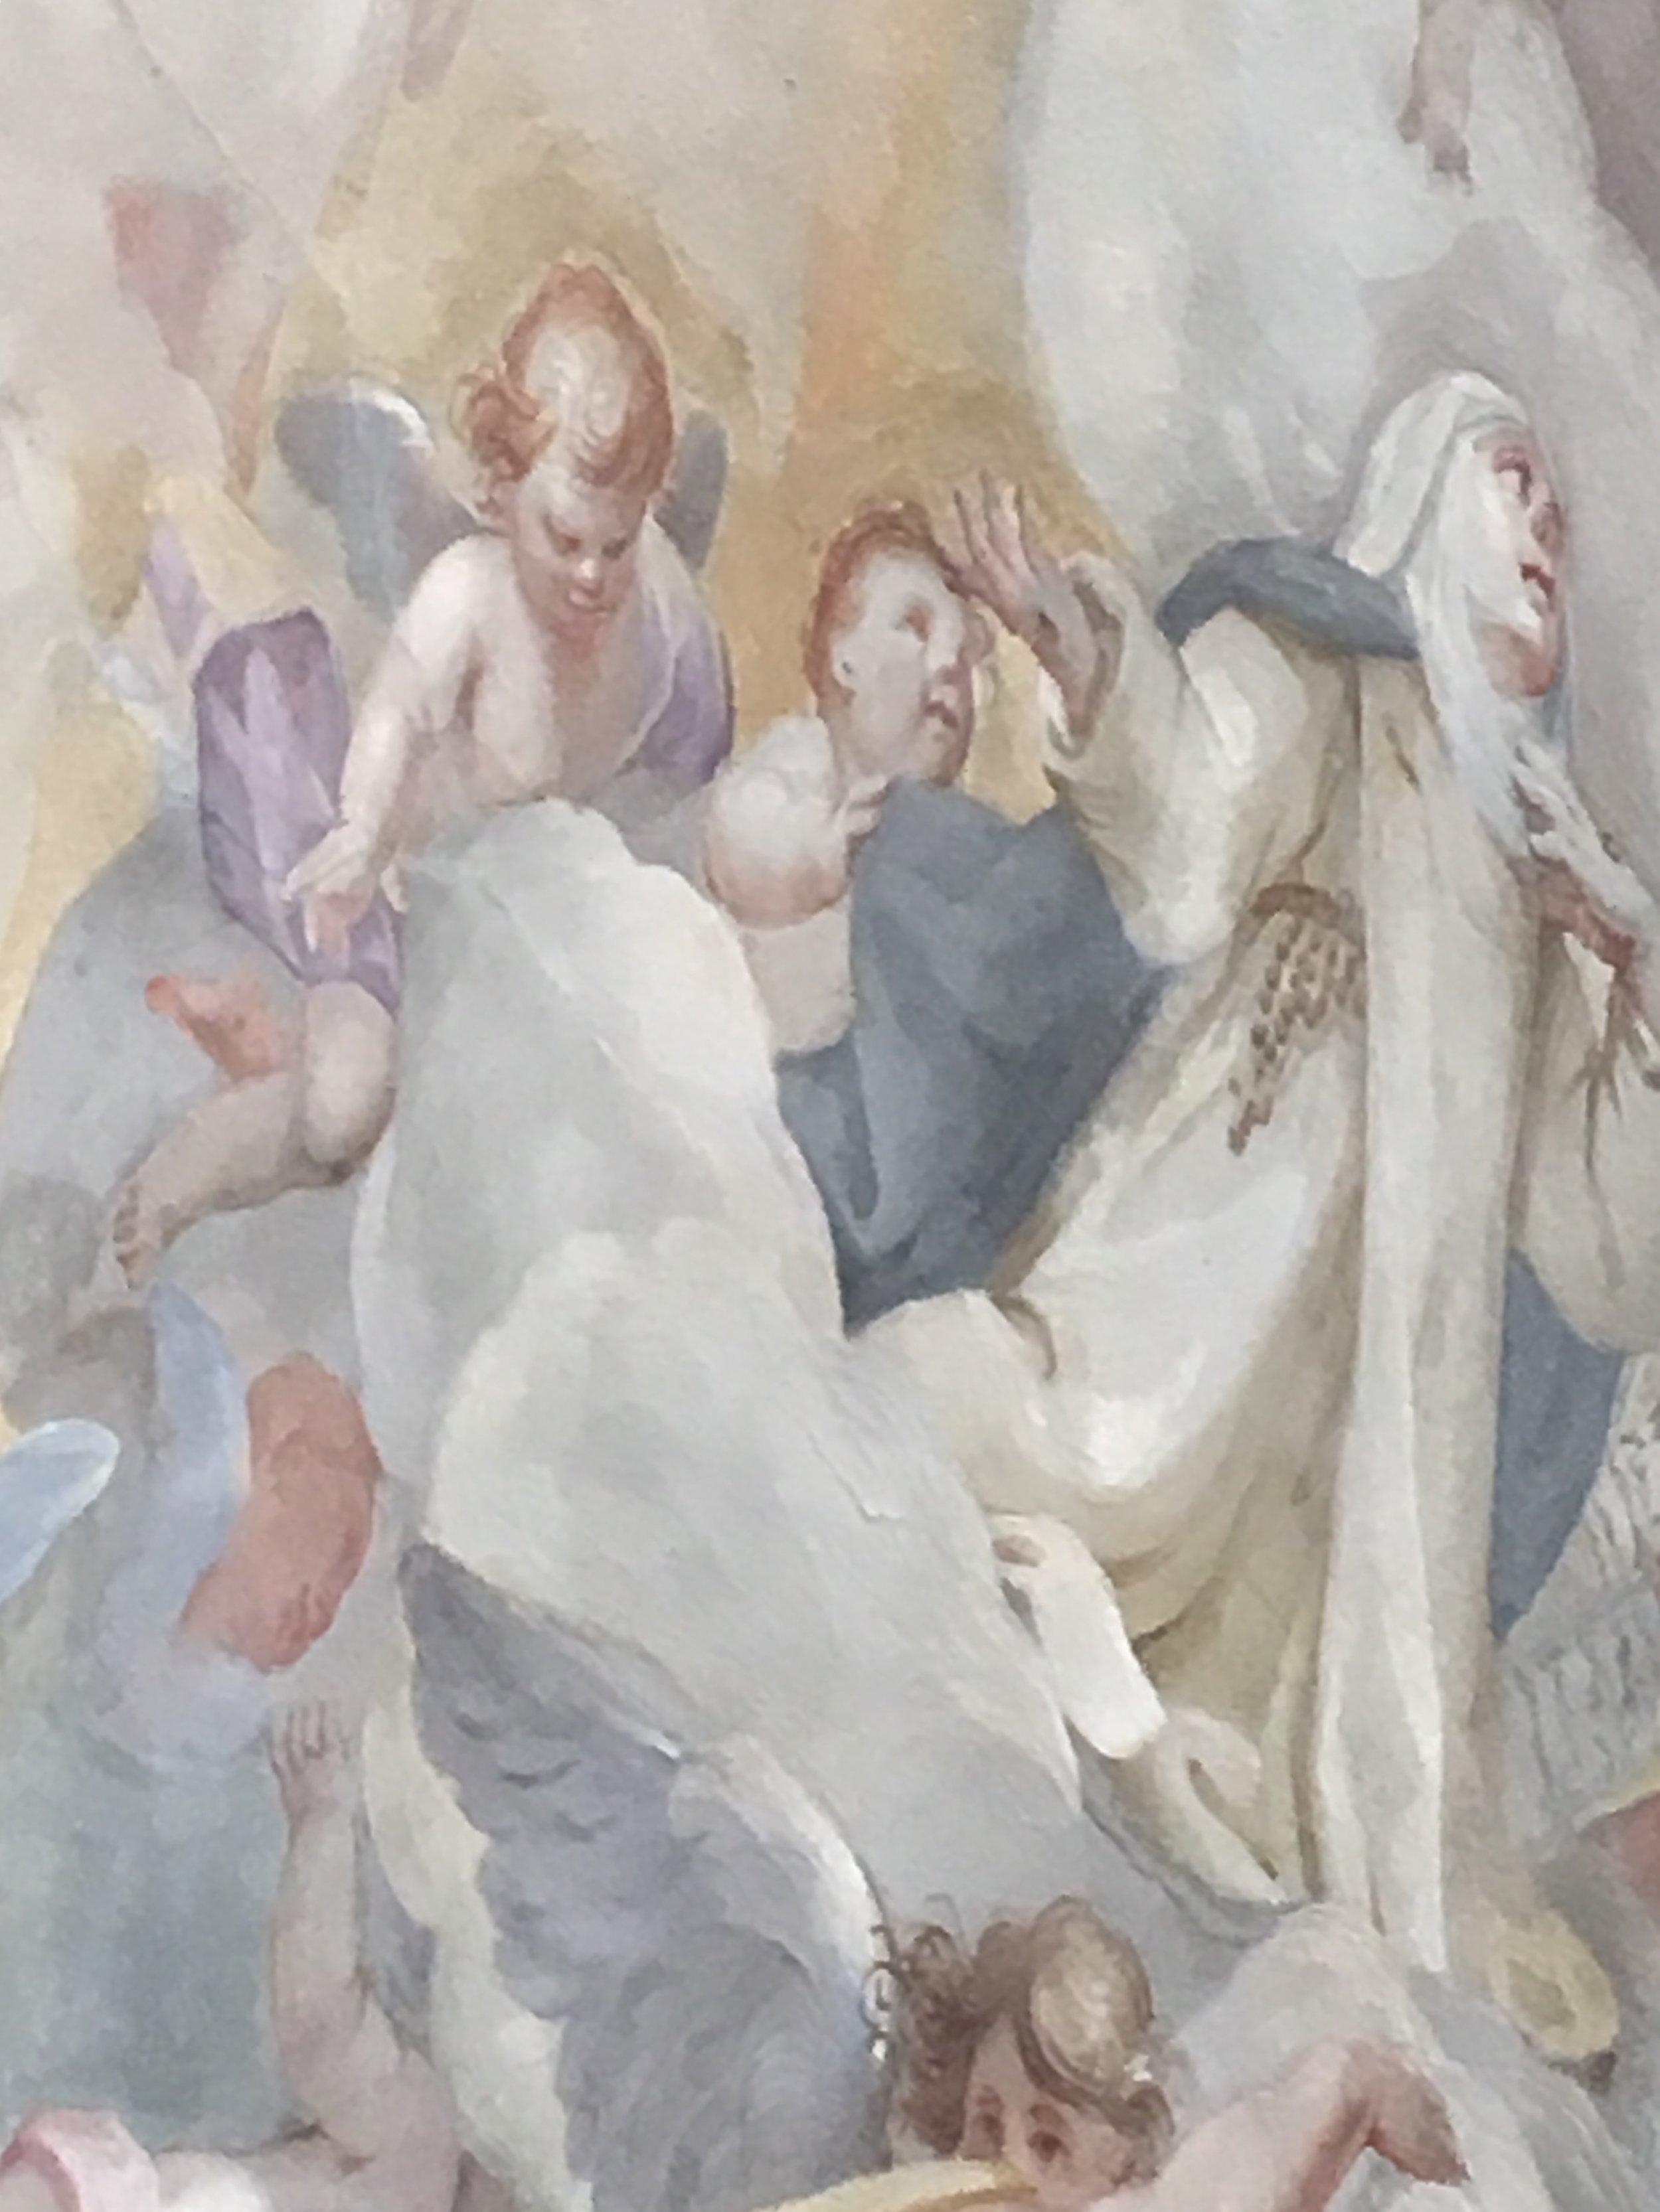 Detail from ceiling fresco